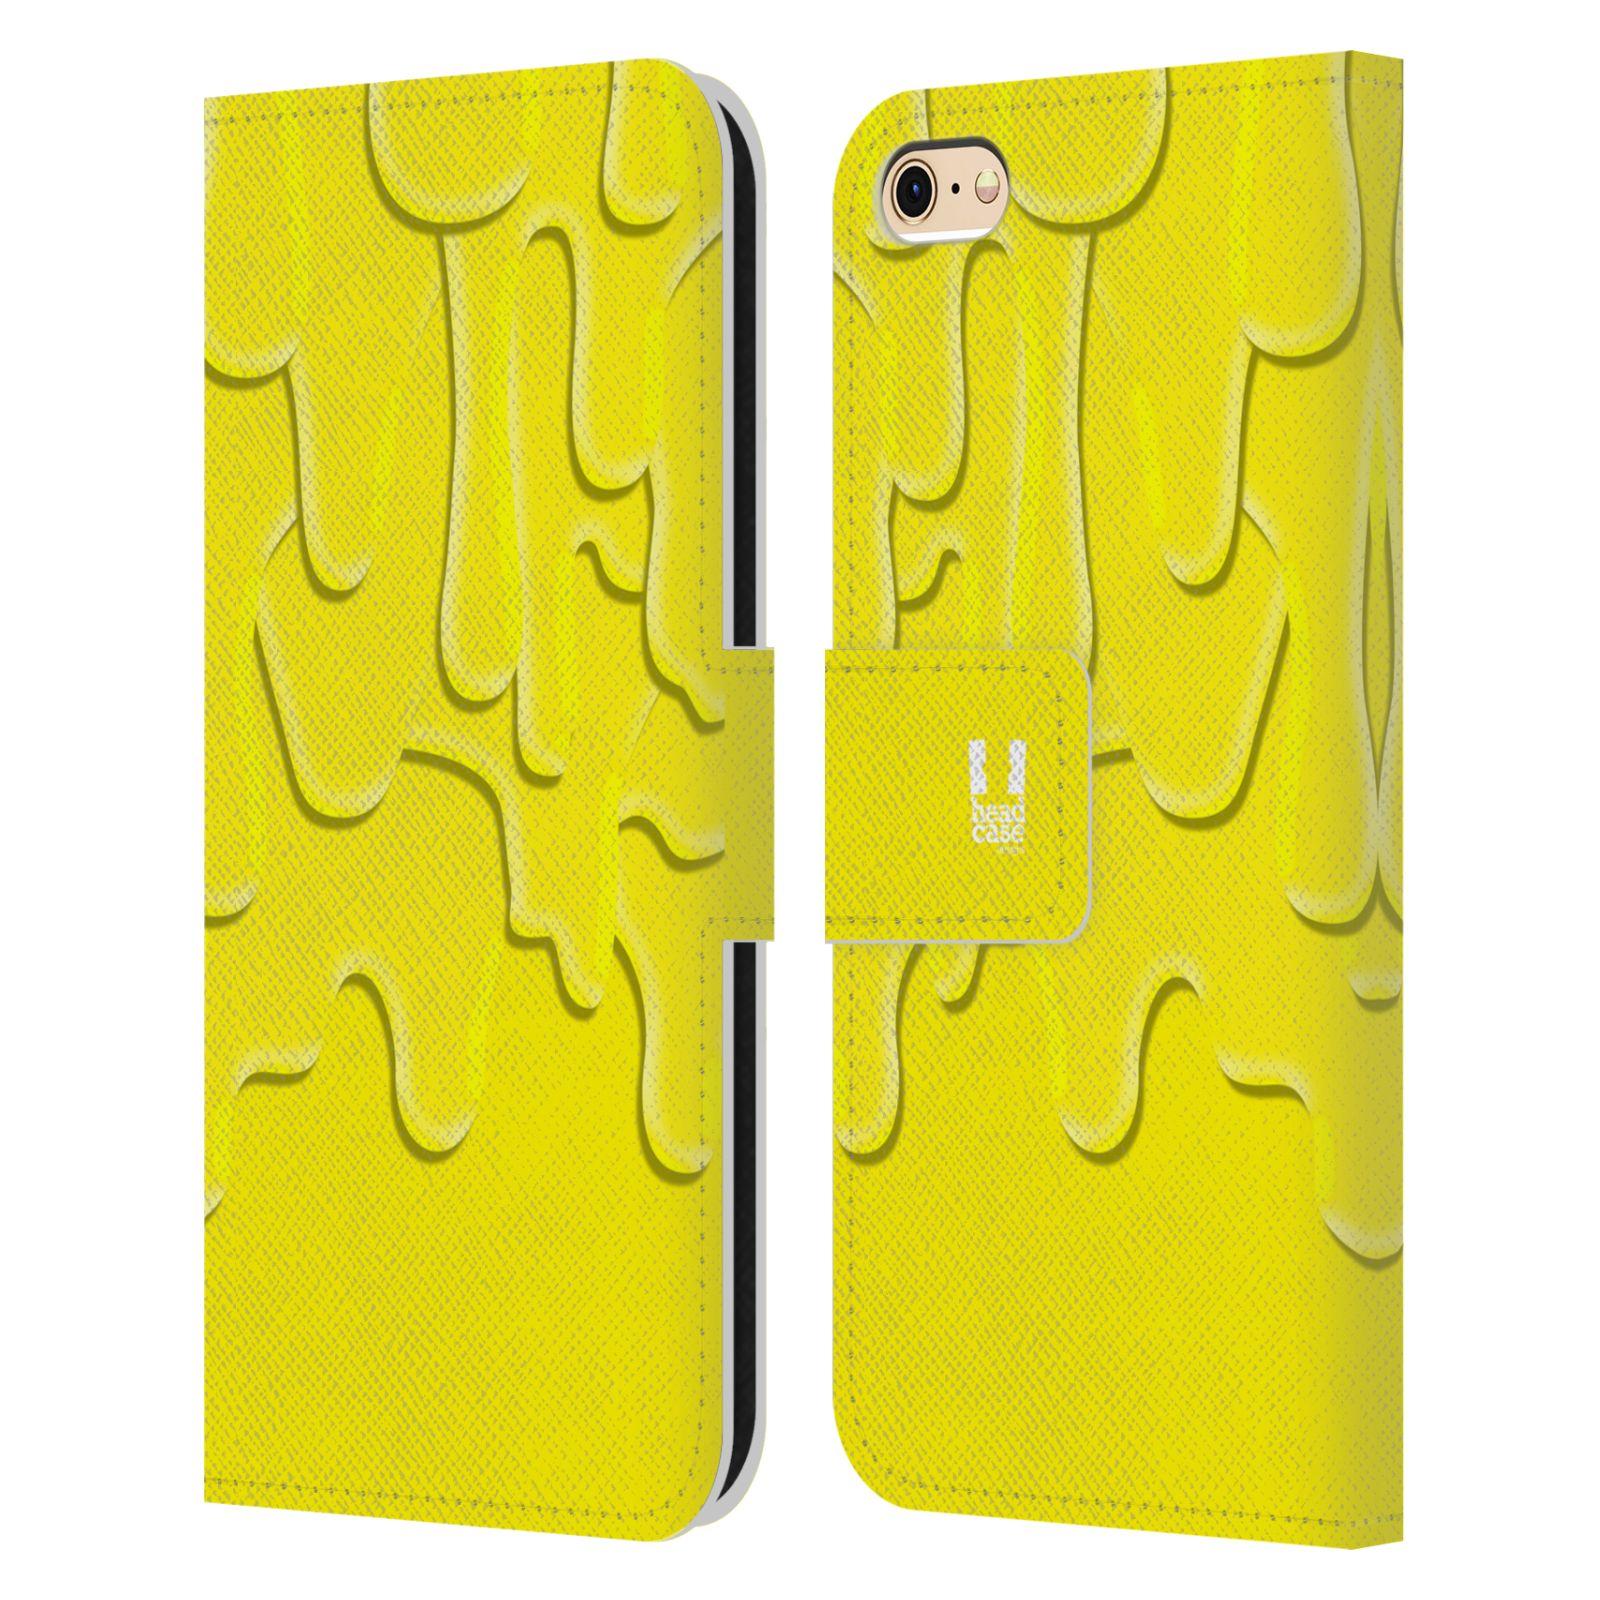 HEAD CASE Flipové pouzdro pro mobil Apple Iphone 6/6s ZÁPLAVA BARVA žlutá